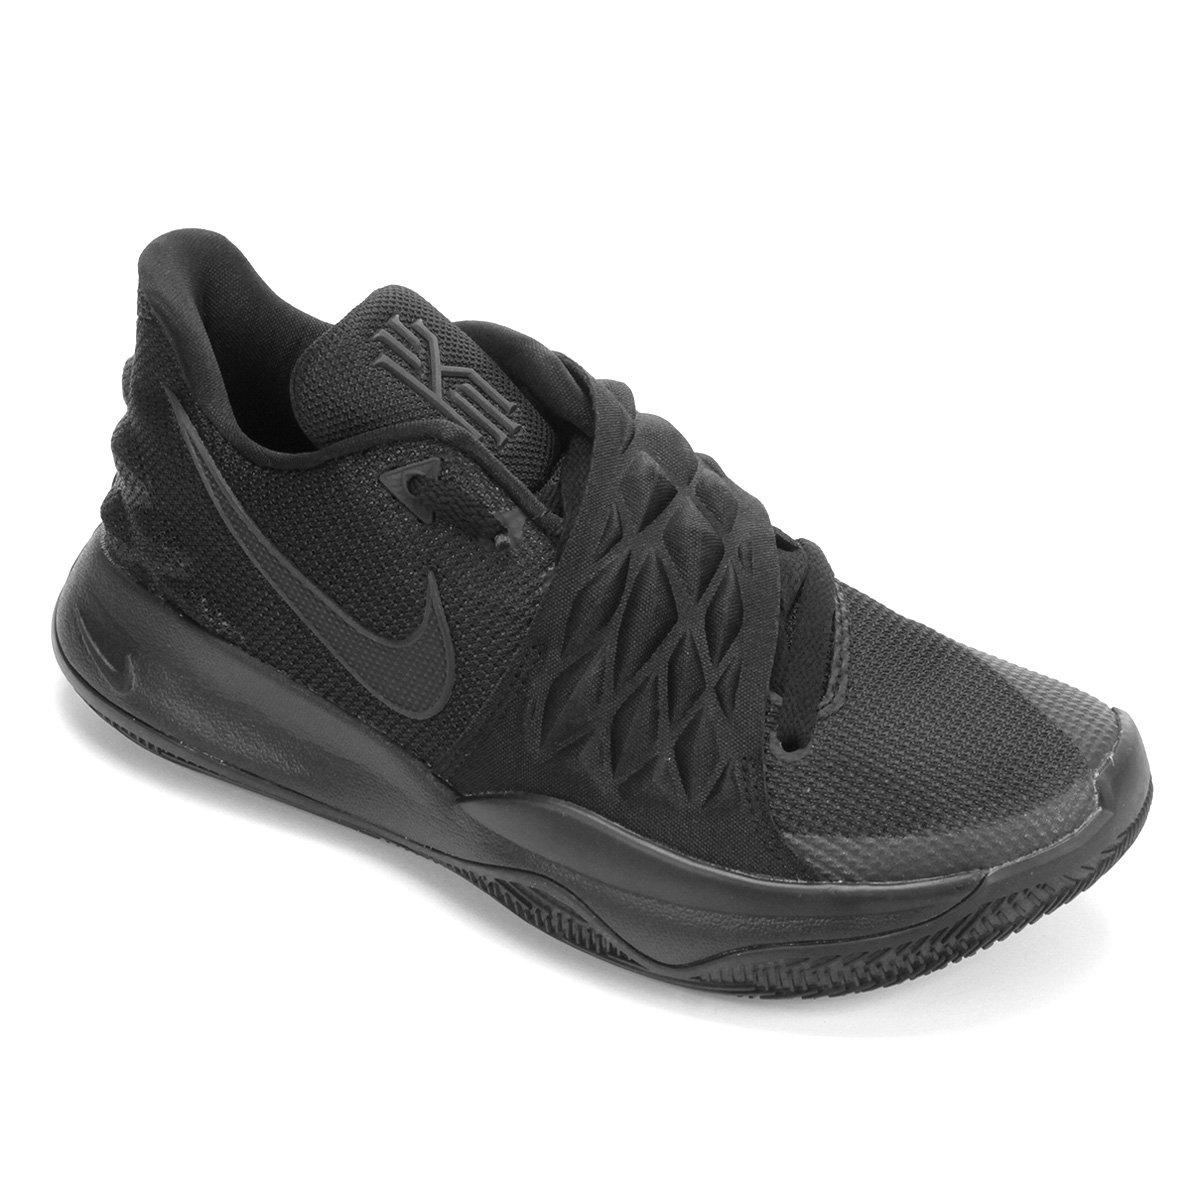 bb821571e19 Tênis Nike Kyrie Low Masculino - Compre Agora